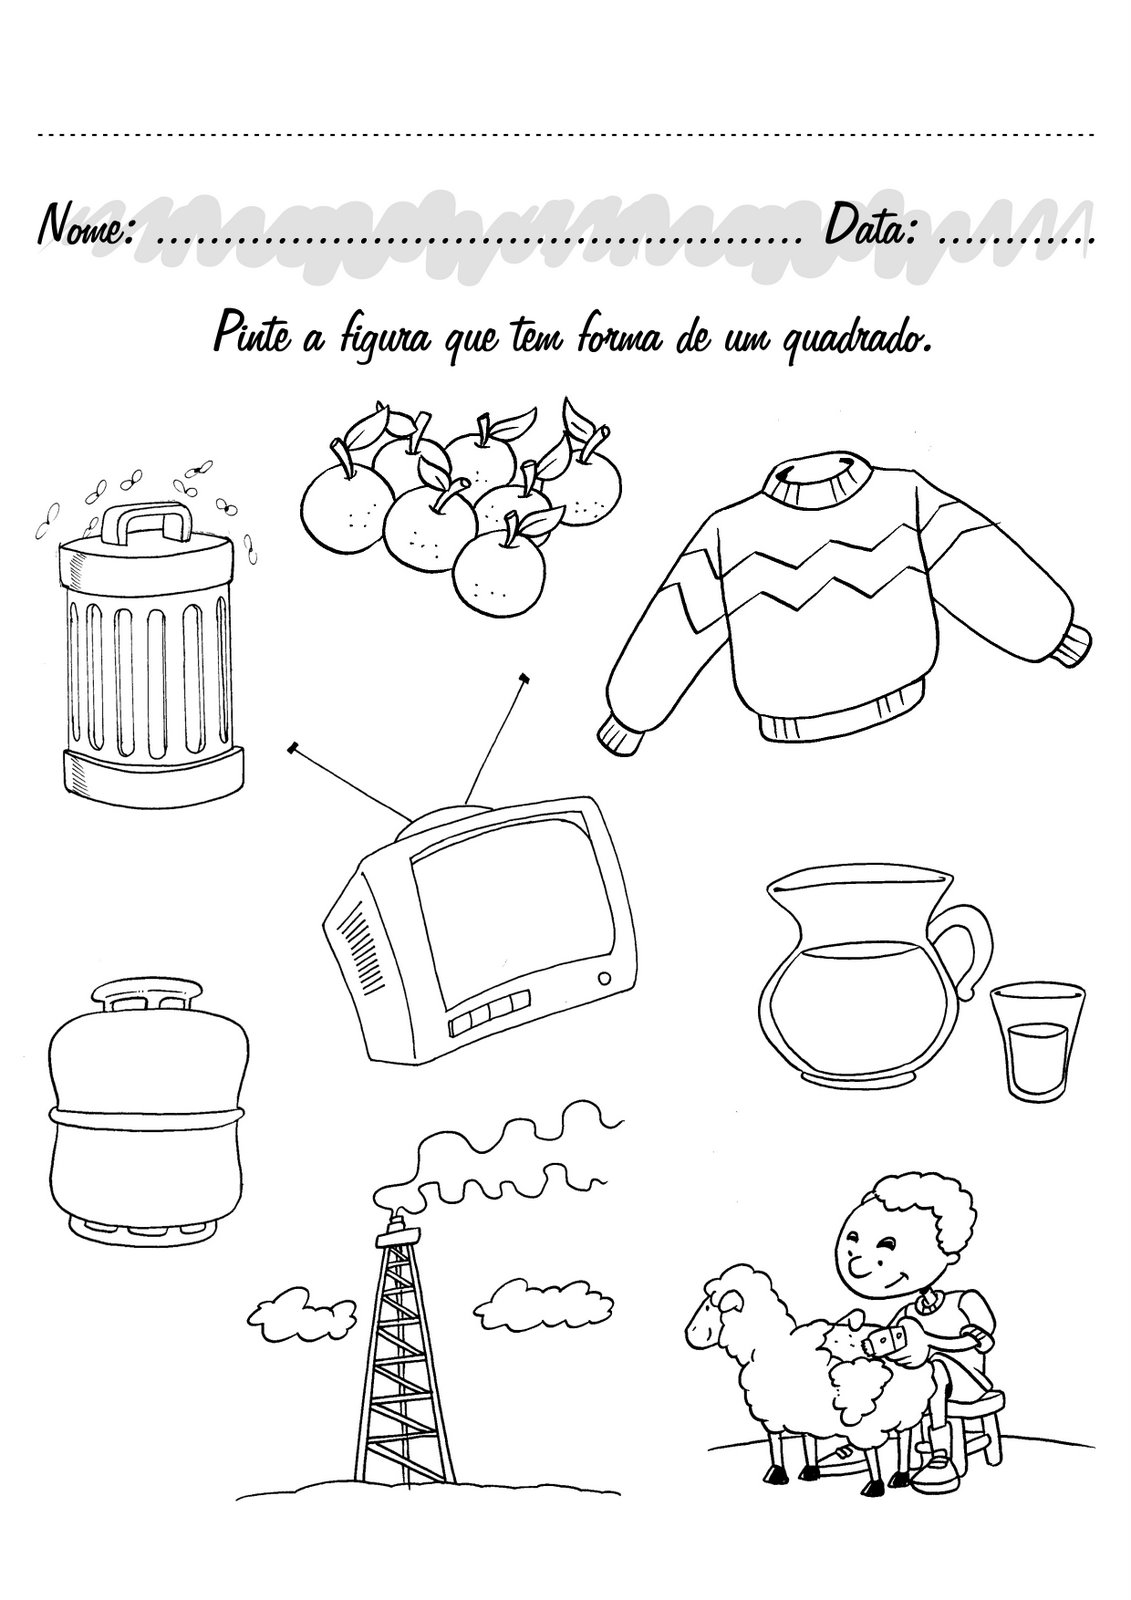 Fabuloso O mundo colorido: Atividades para pré-escolar-Parte 5 IO35